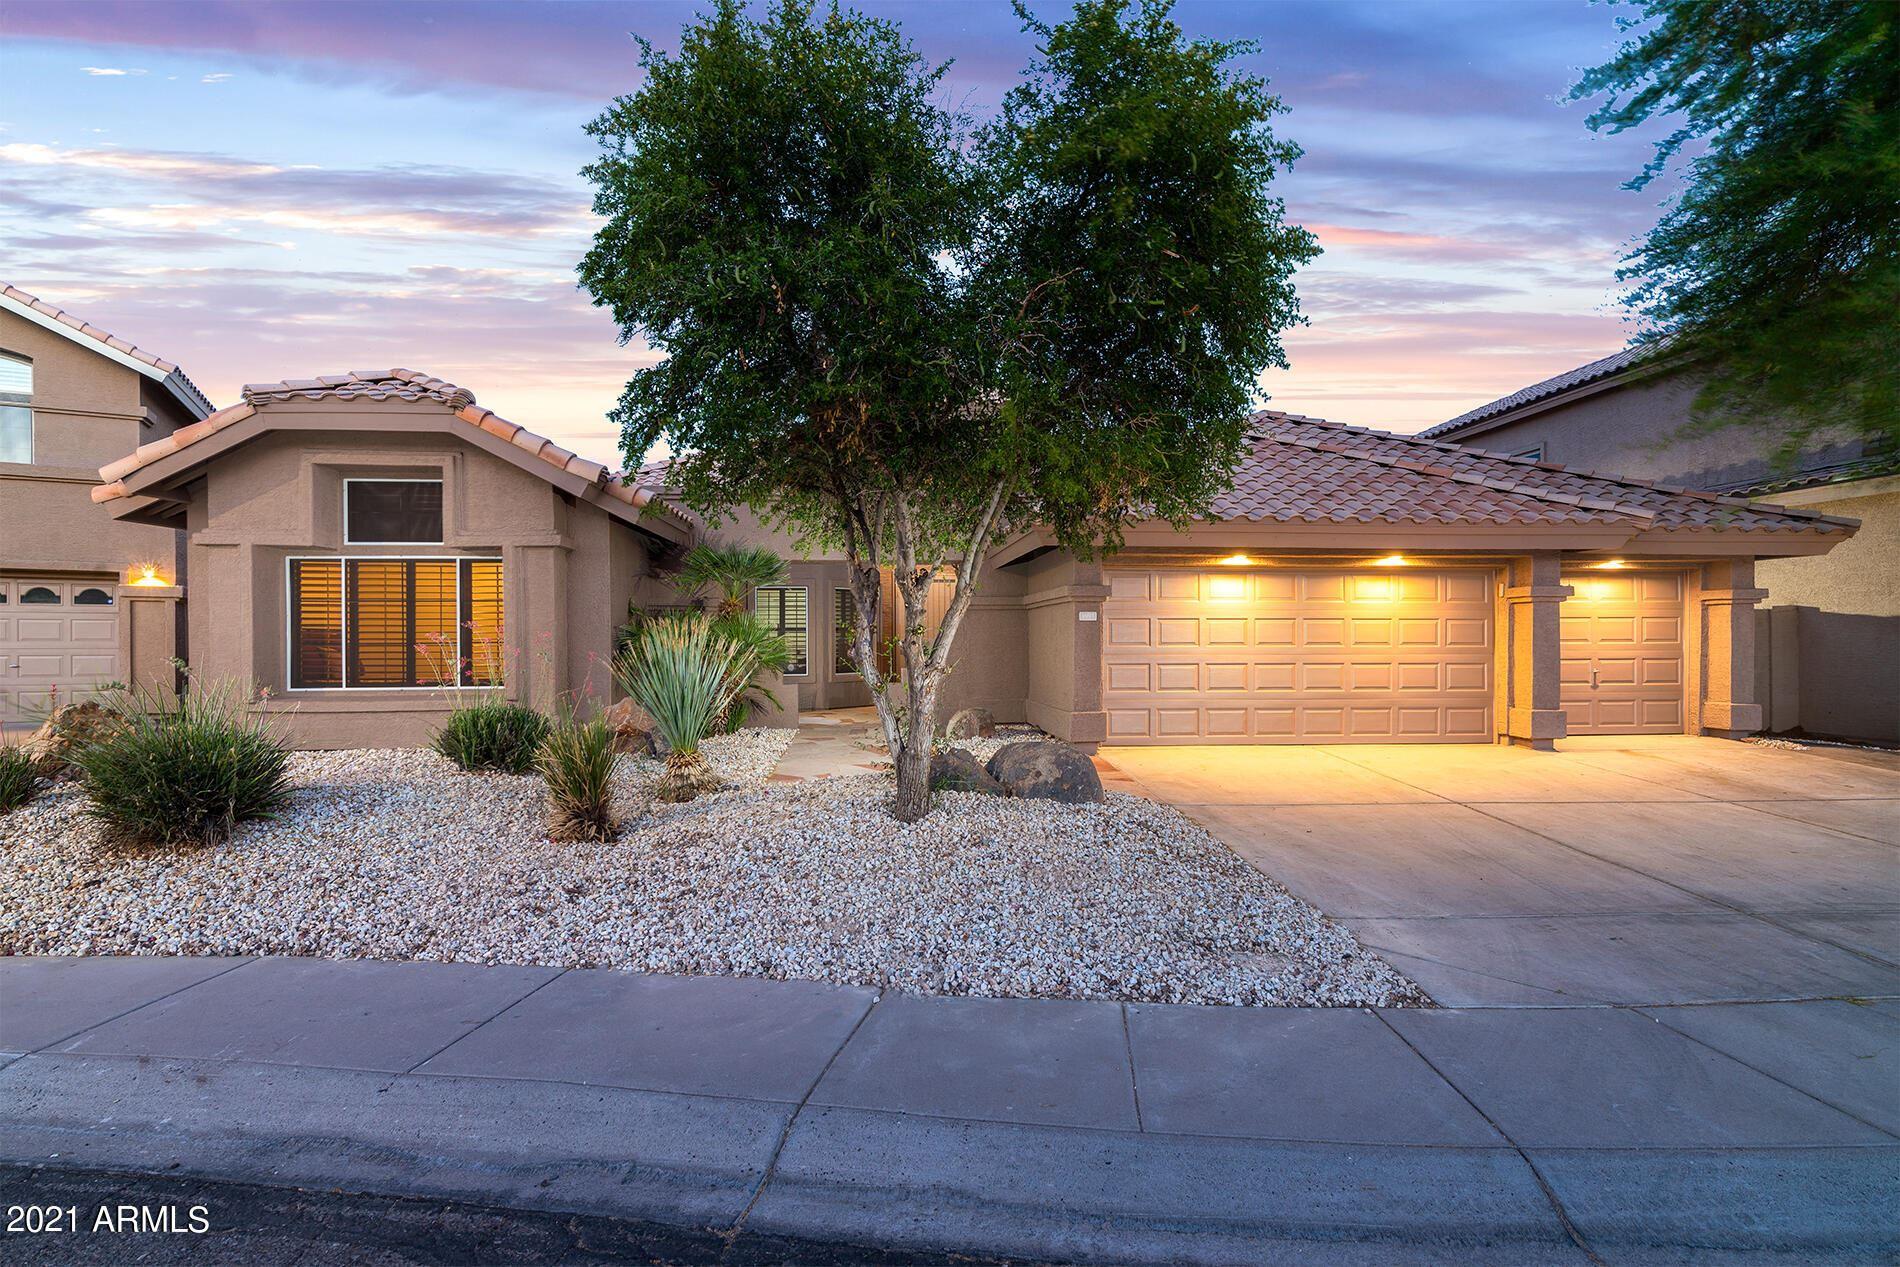 1693 E GLENHAVEN Drive, Phoenix, AZ 85048 - MLS#: 6248644